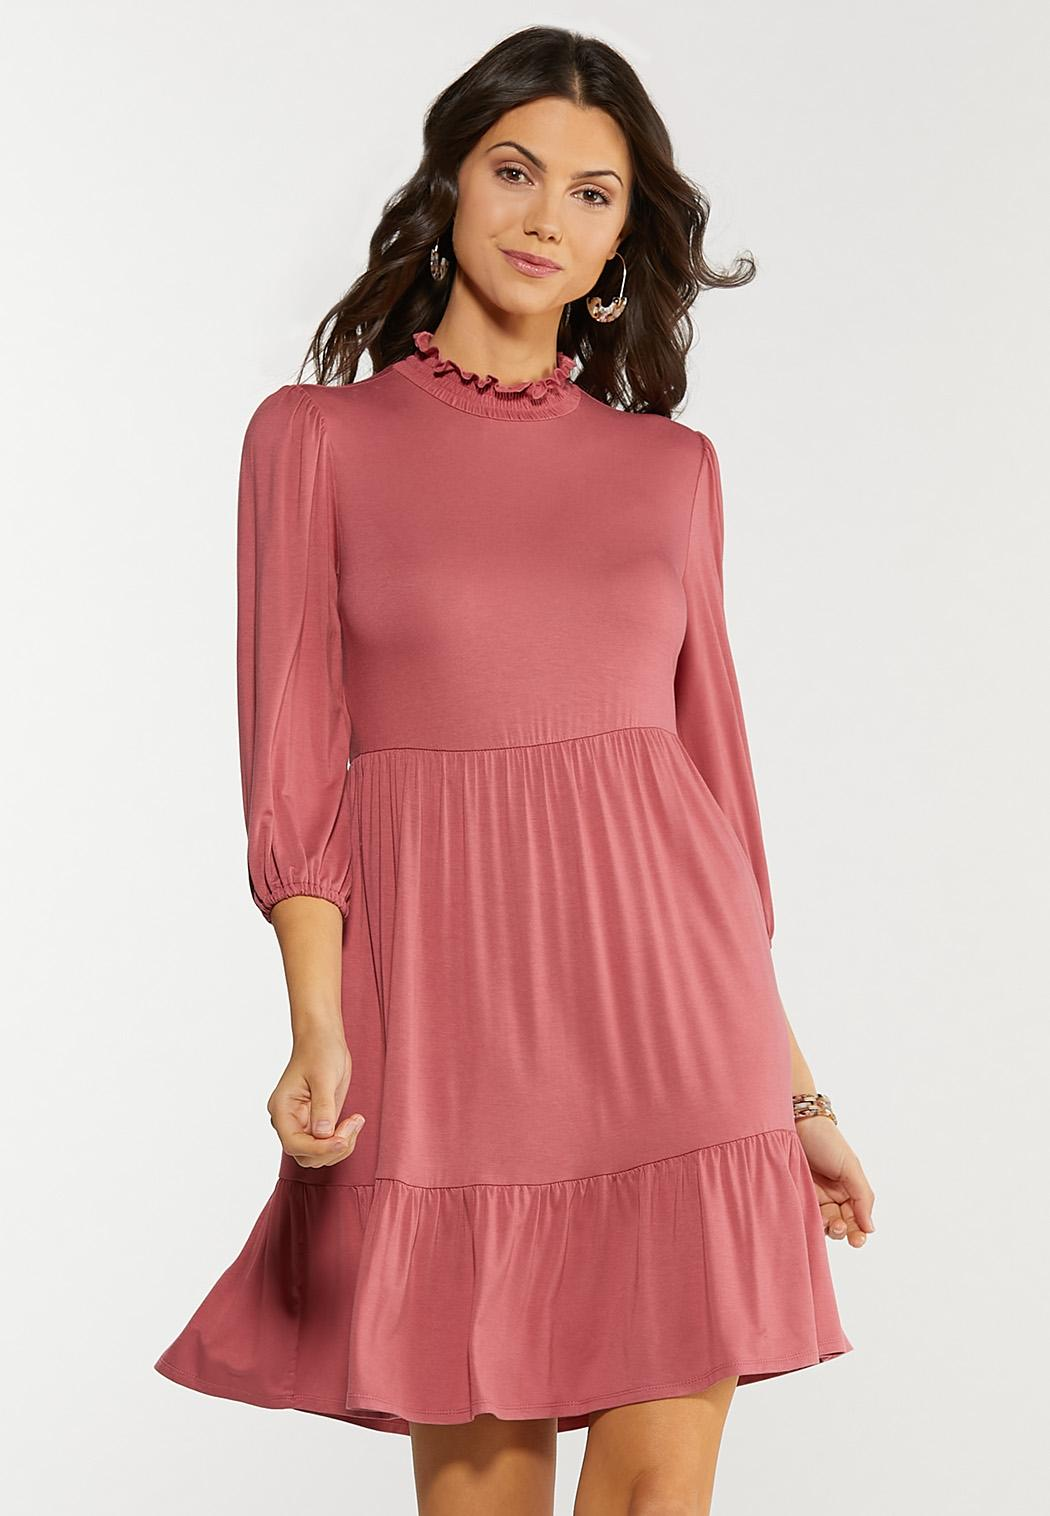 Ruffled Mock Neck Babydoll Dress